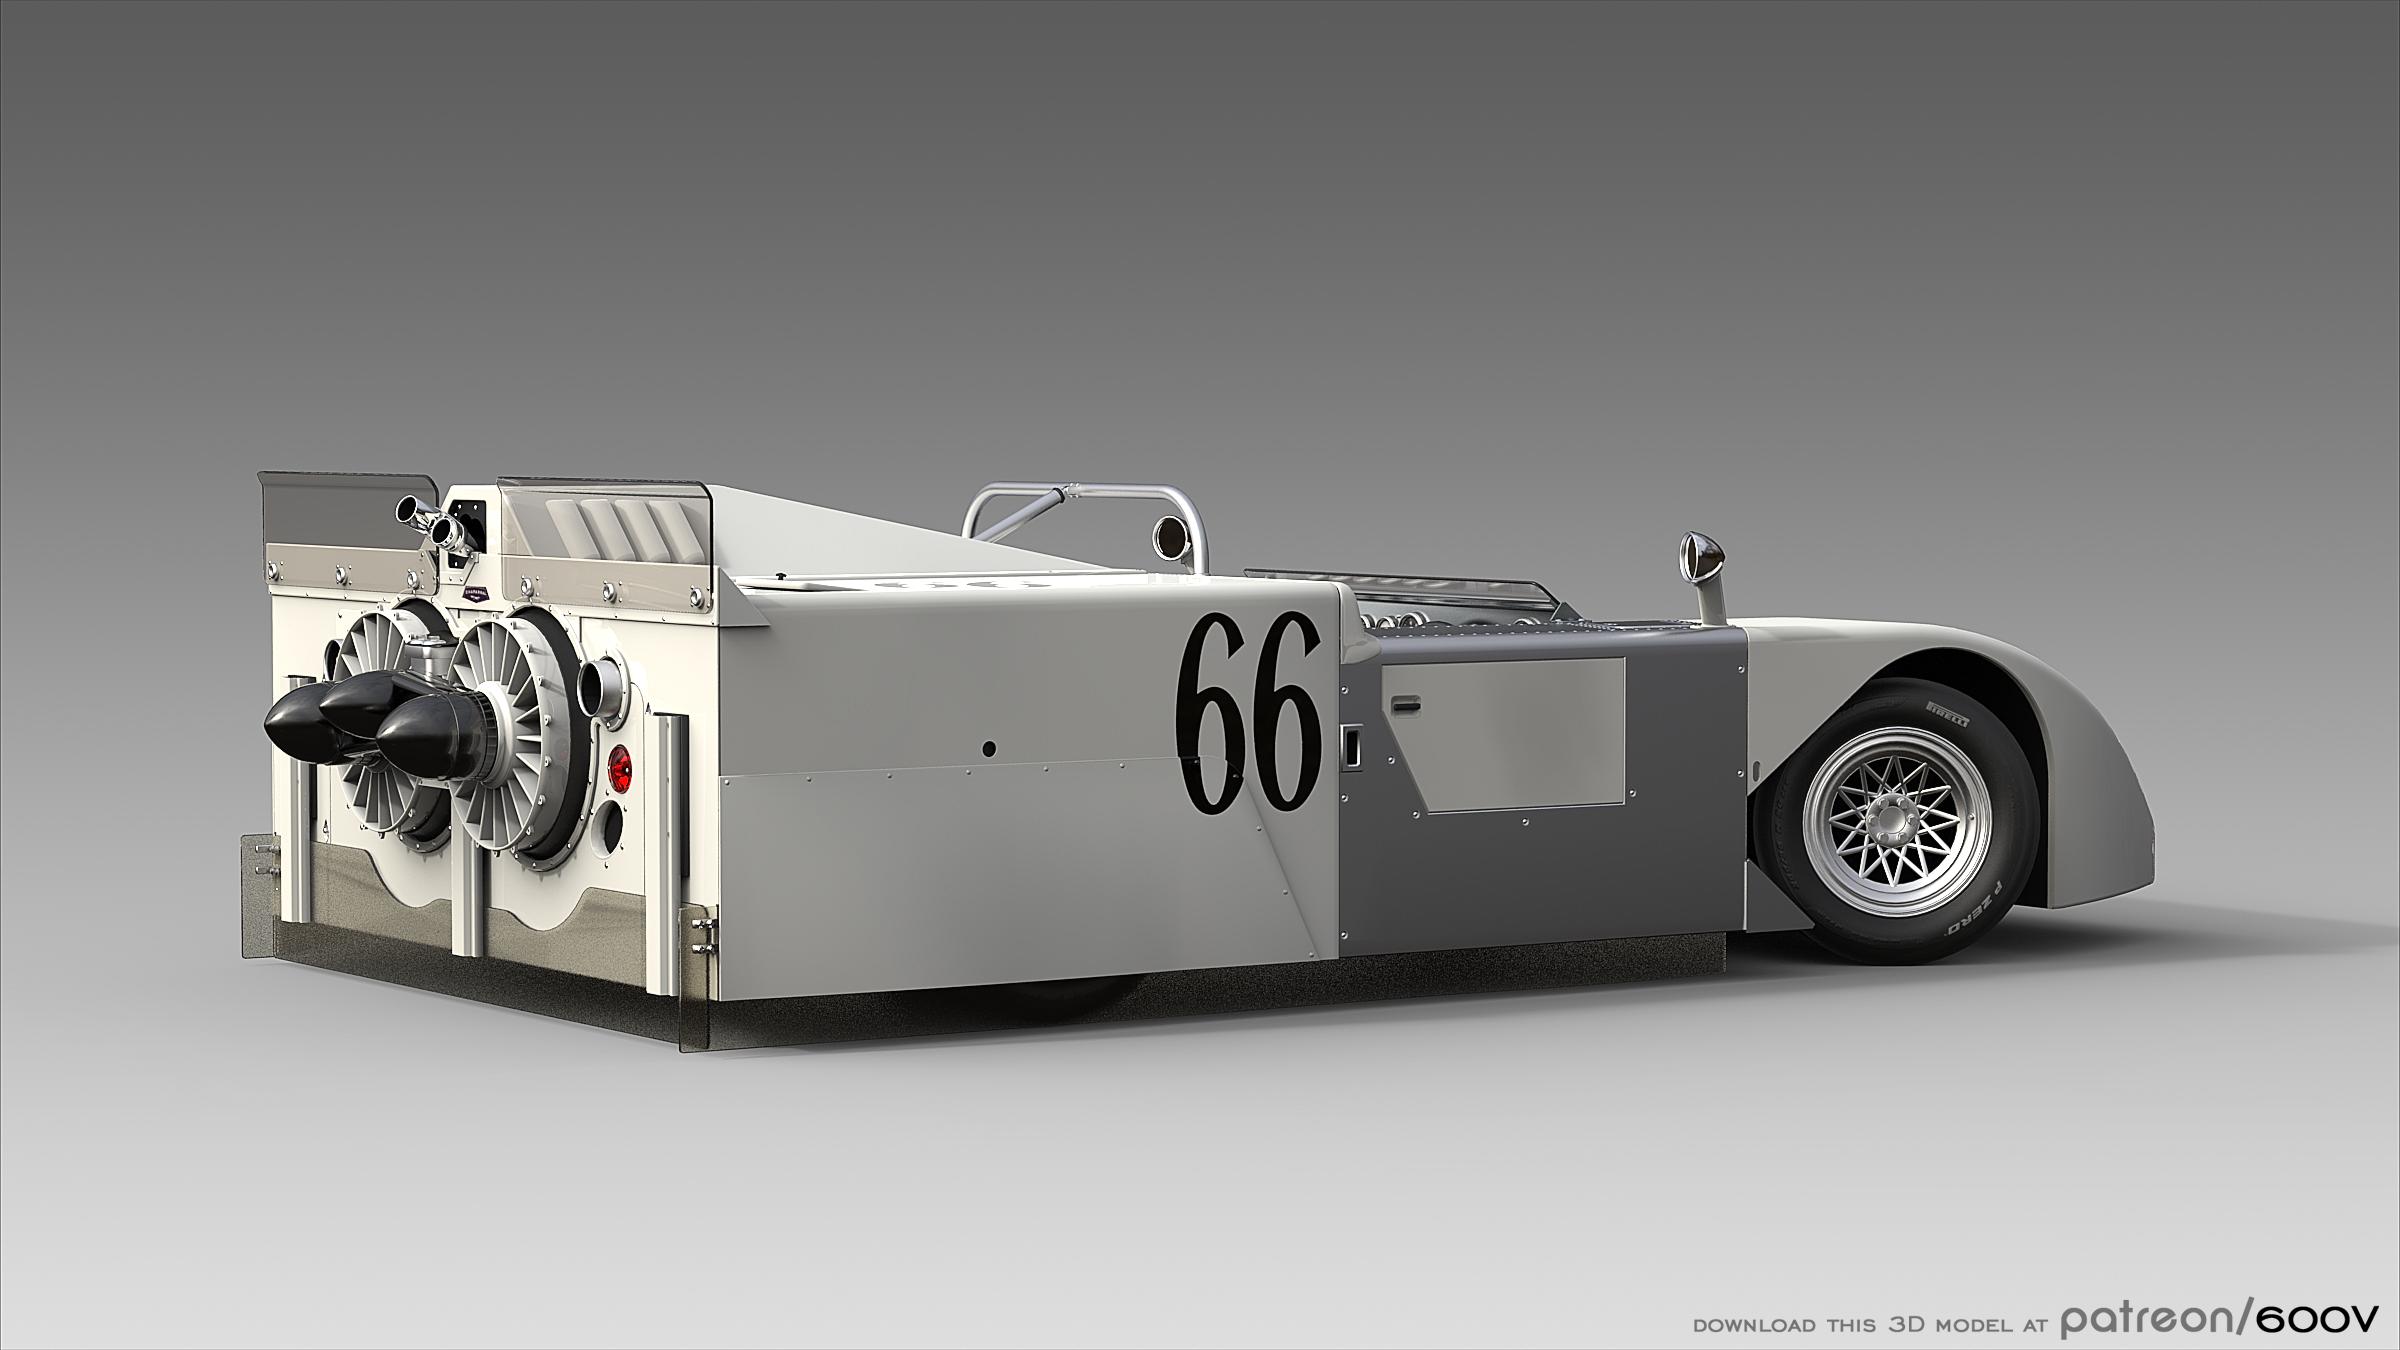 Wallpaper : race cars, old car, sports car, 600v, Chaparral, 2J ...